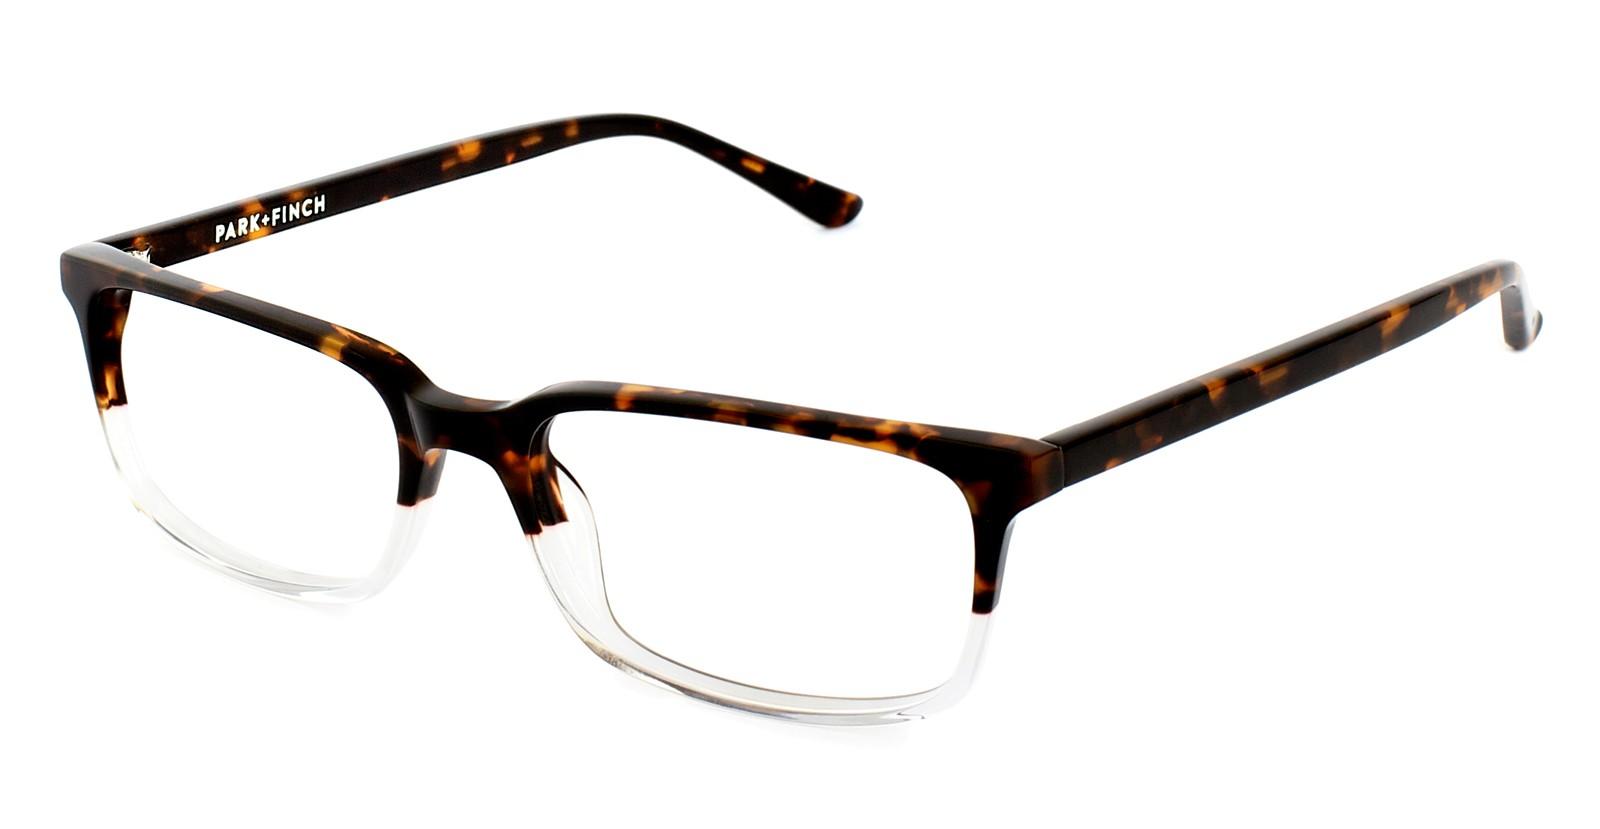 b2d66dac32 Wharton Prescription Eyeglasses in Two-tone